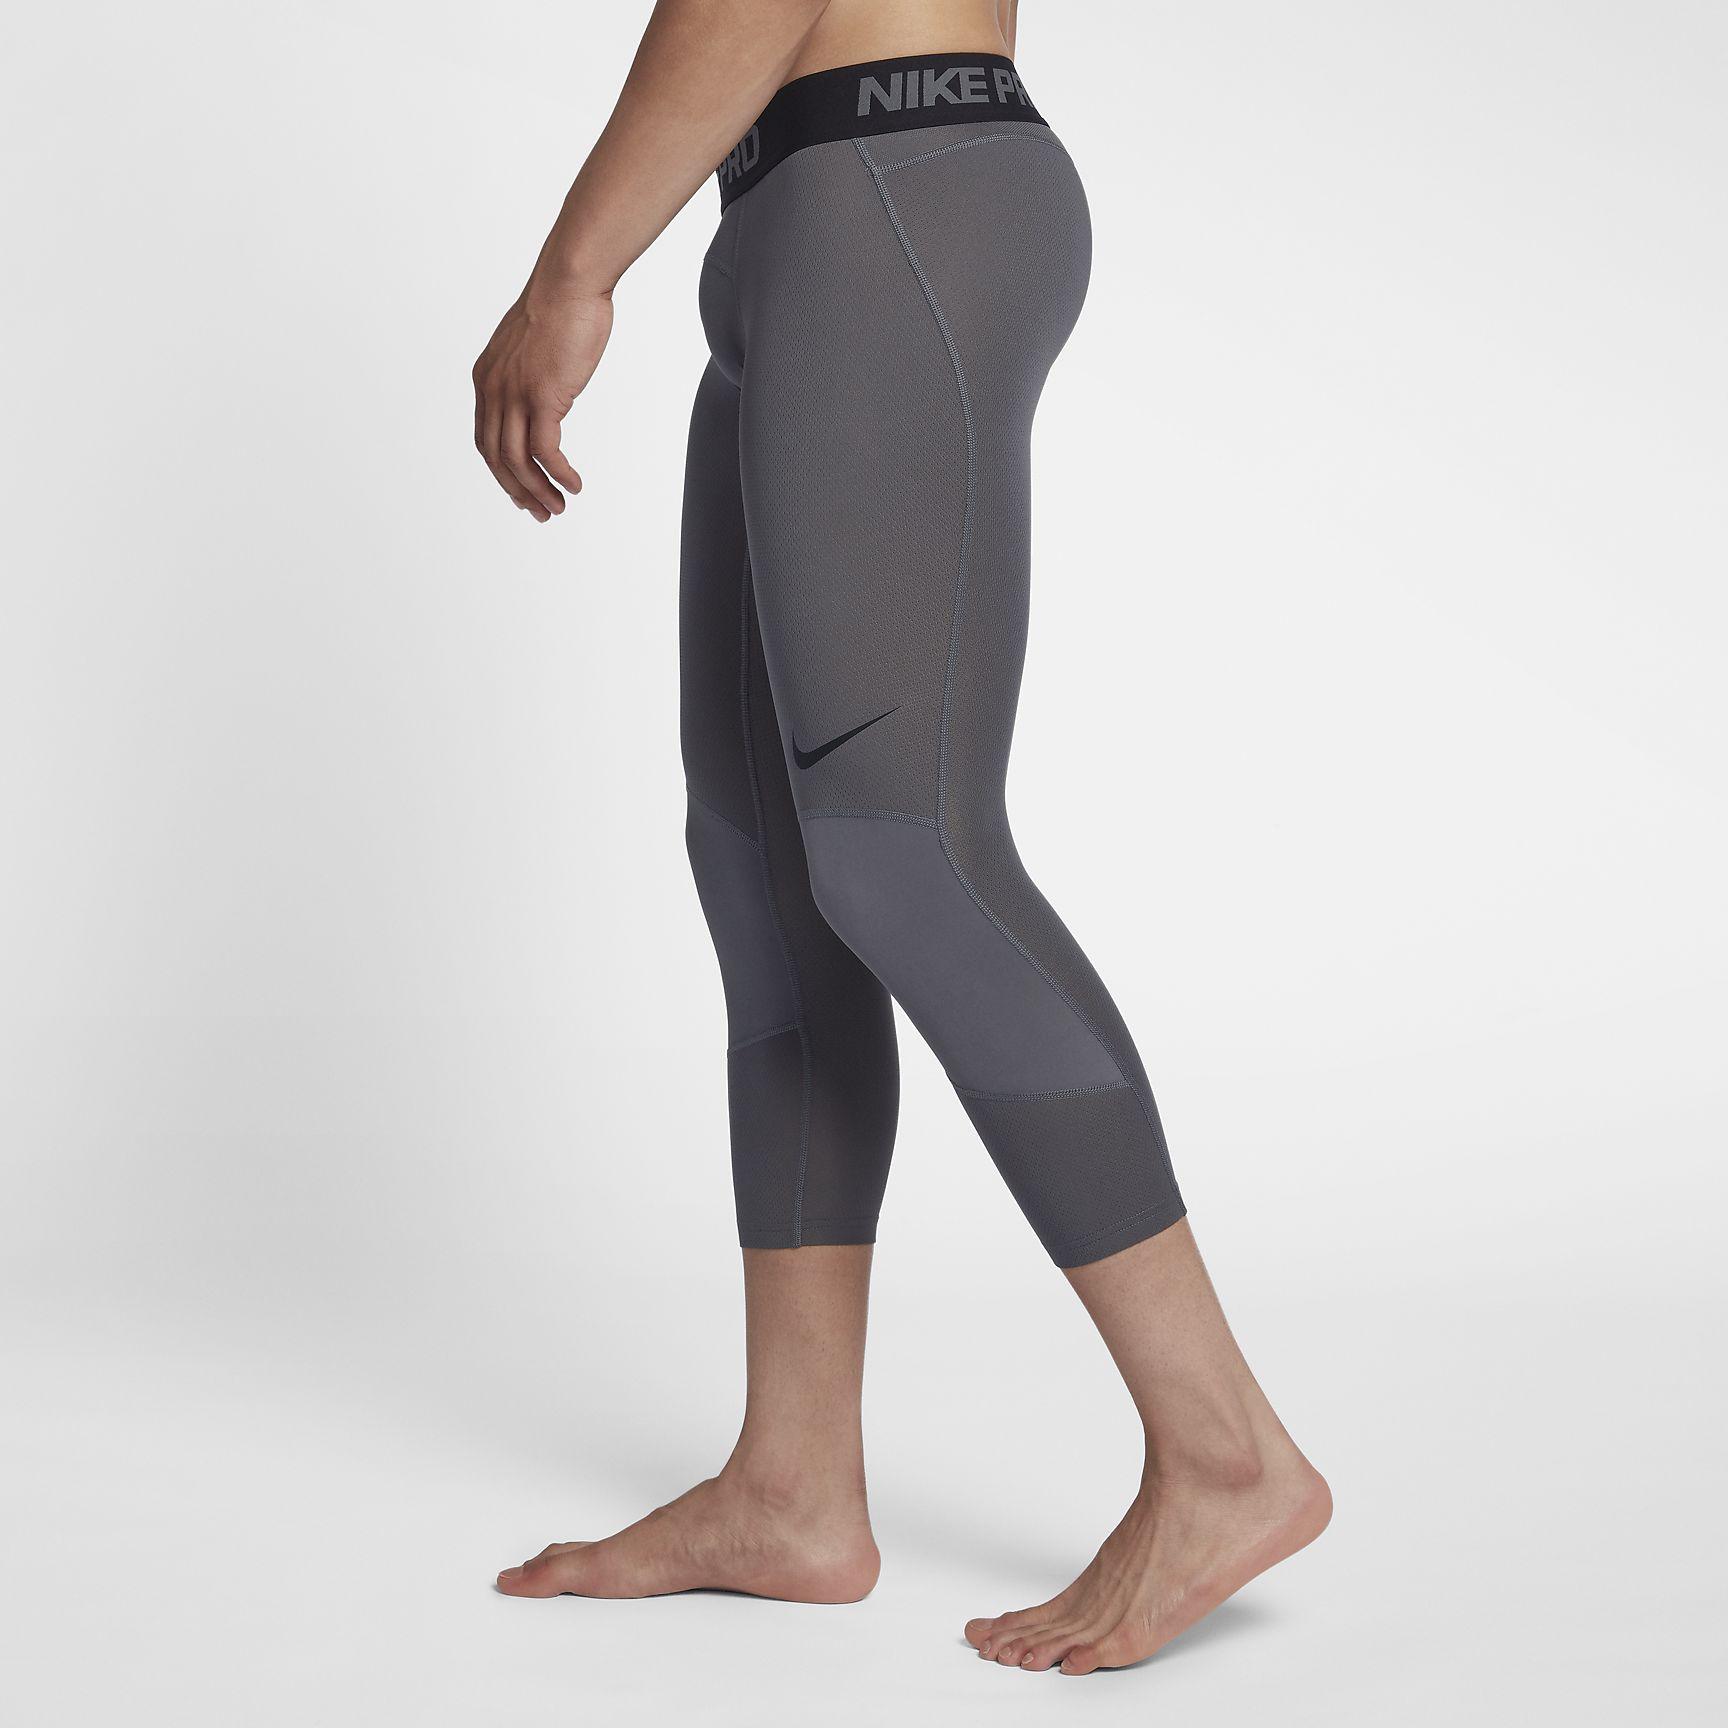 4f66e0c81f7bb Nike Pro Dri-FIT 3/4 Basketball Tights - SPORTING GOODS Athletic Underwear  - Superfanas.lt